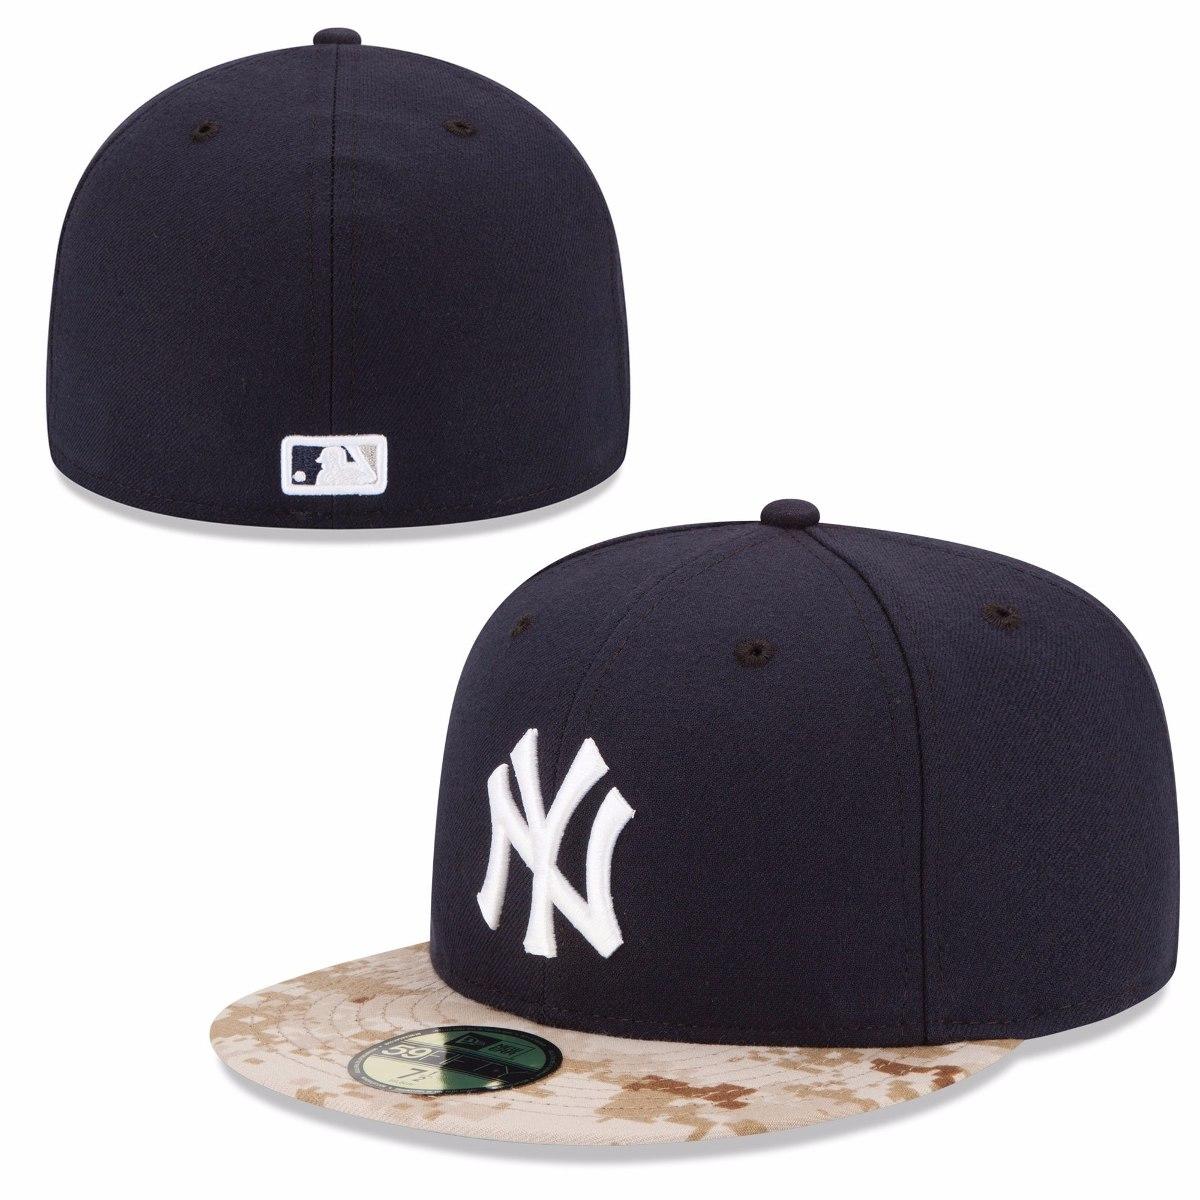 c5b24367190a7 New Era Gorra Yankees De Ny 5950 7 1 8 Memorial On Field Nva ...